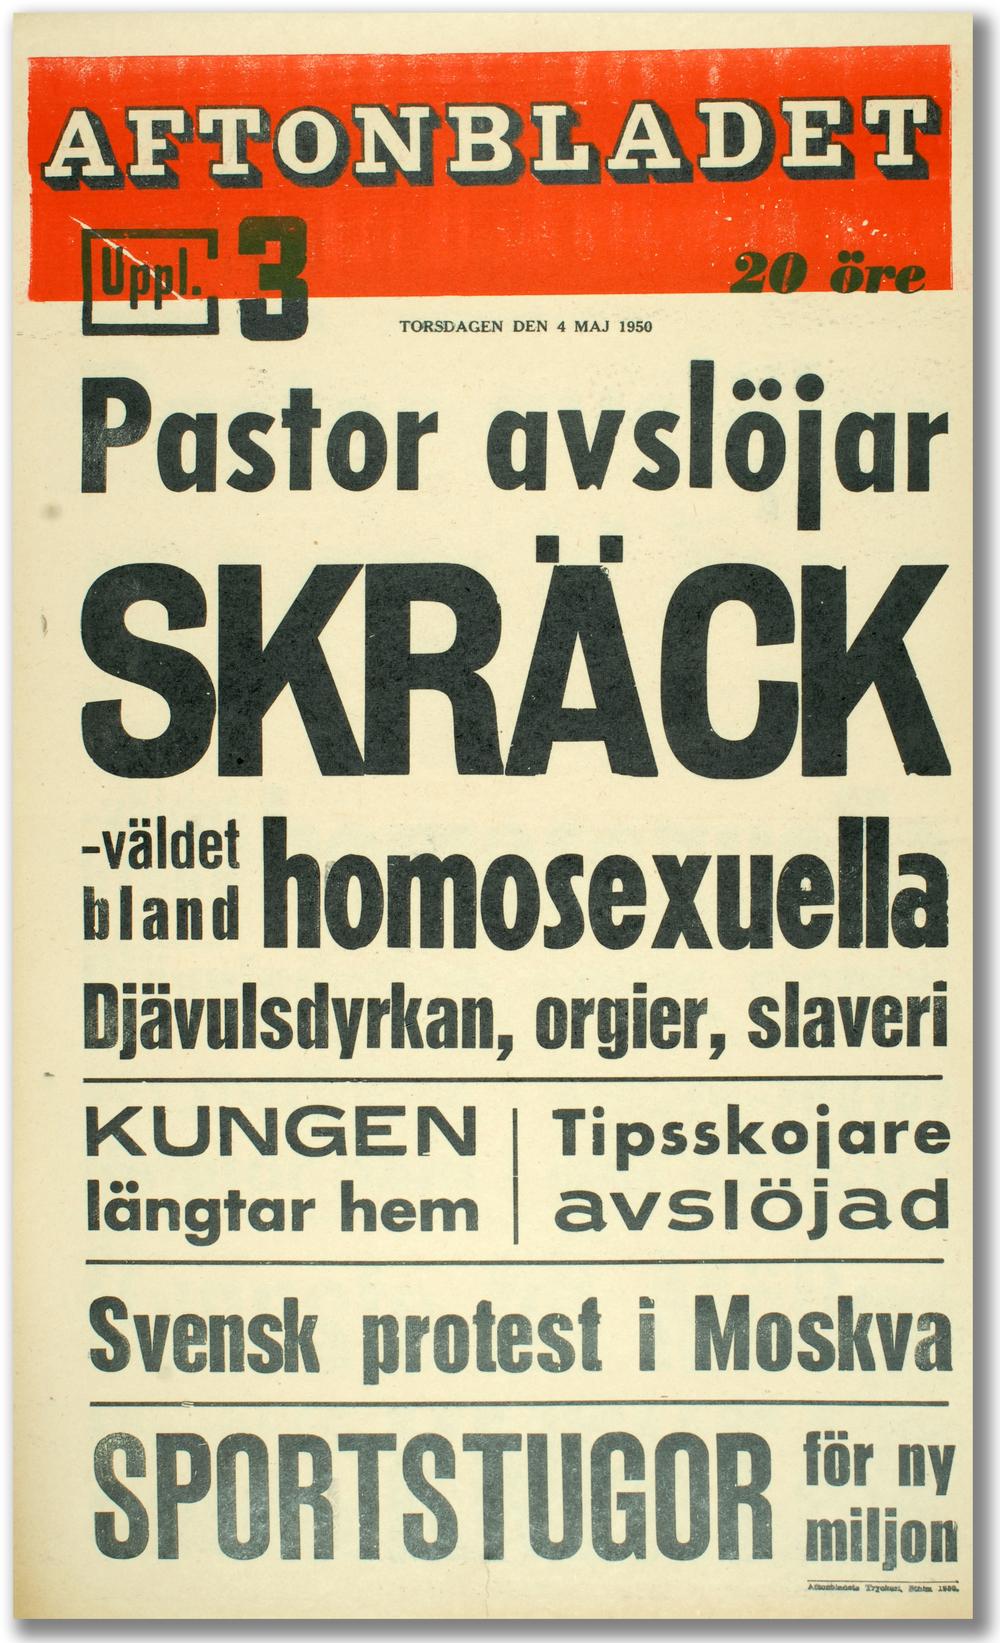 Något stort på spåren. Aftonbladet, 4 maj 1950.